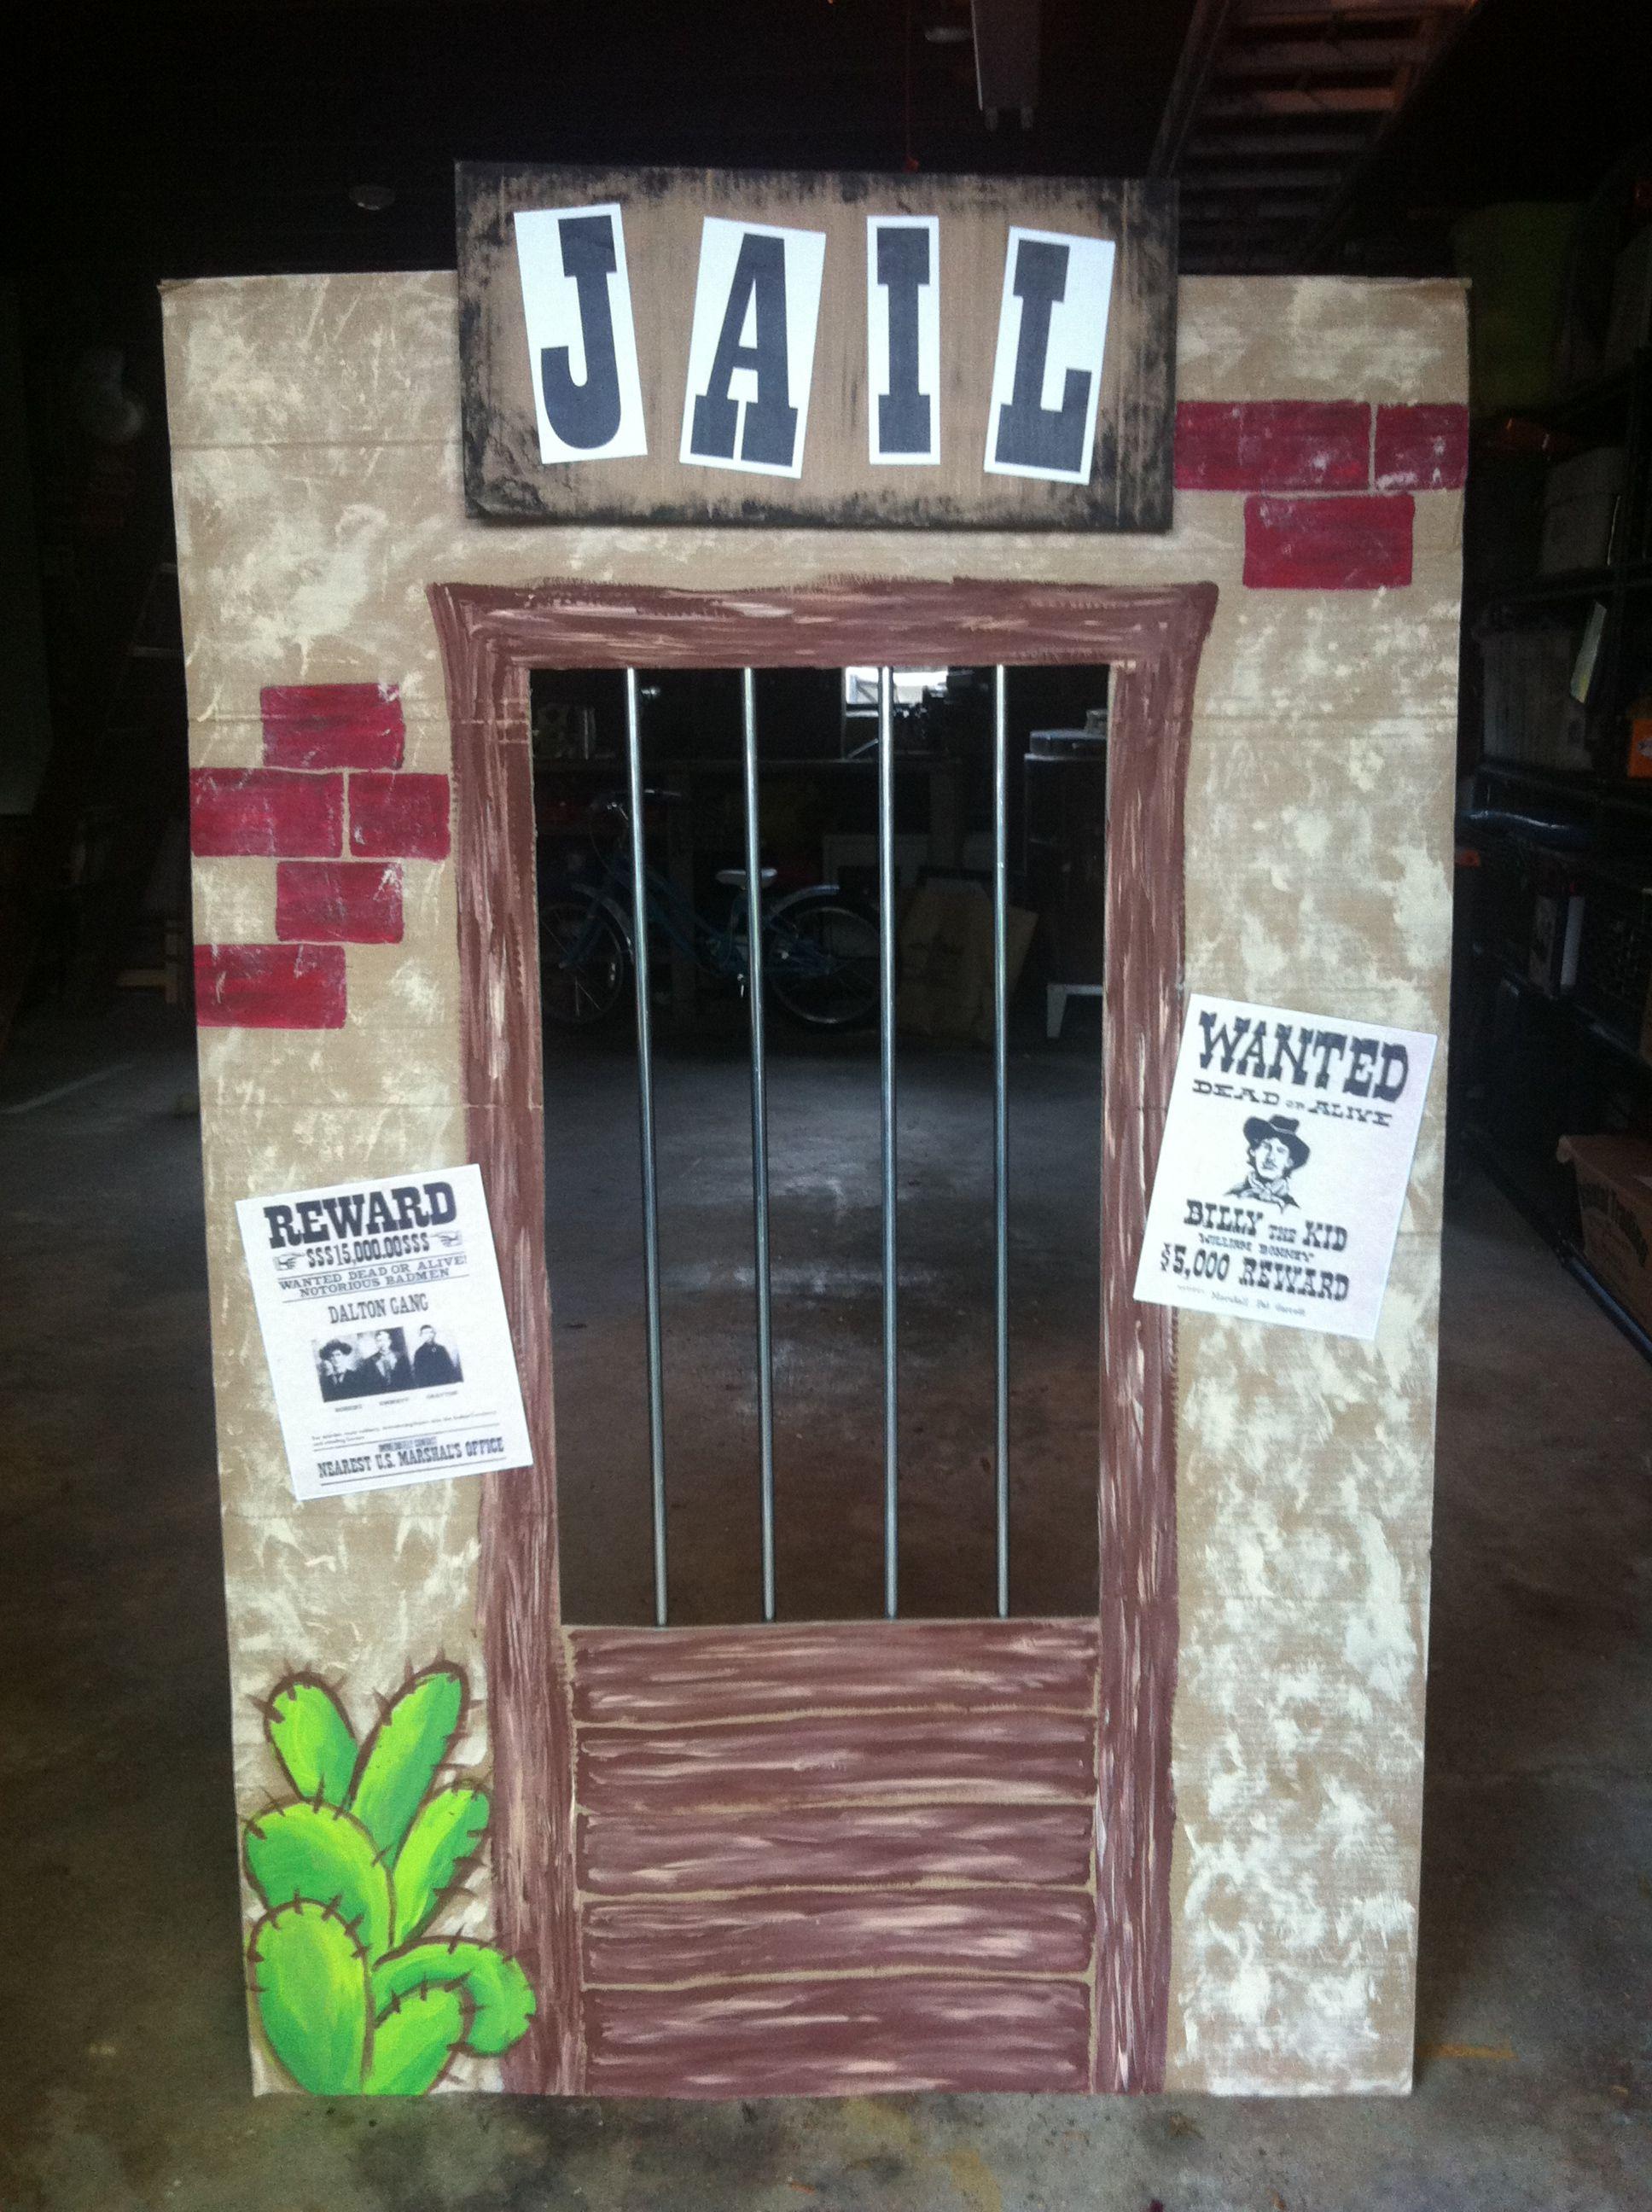 COWGIRL SILHOUETTE WILD WEST Barn Dance THEMED CARDBOARD CUTOUT STANDEE STANDUP